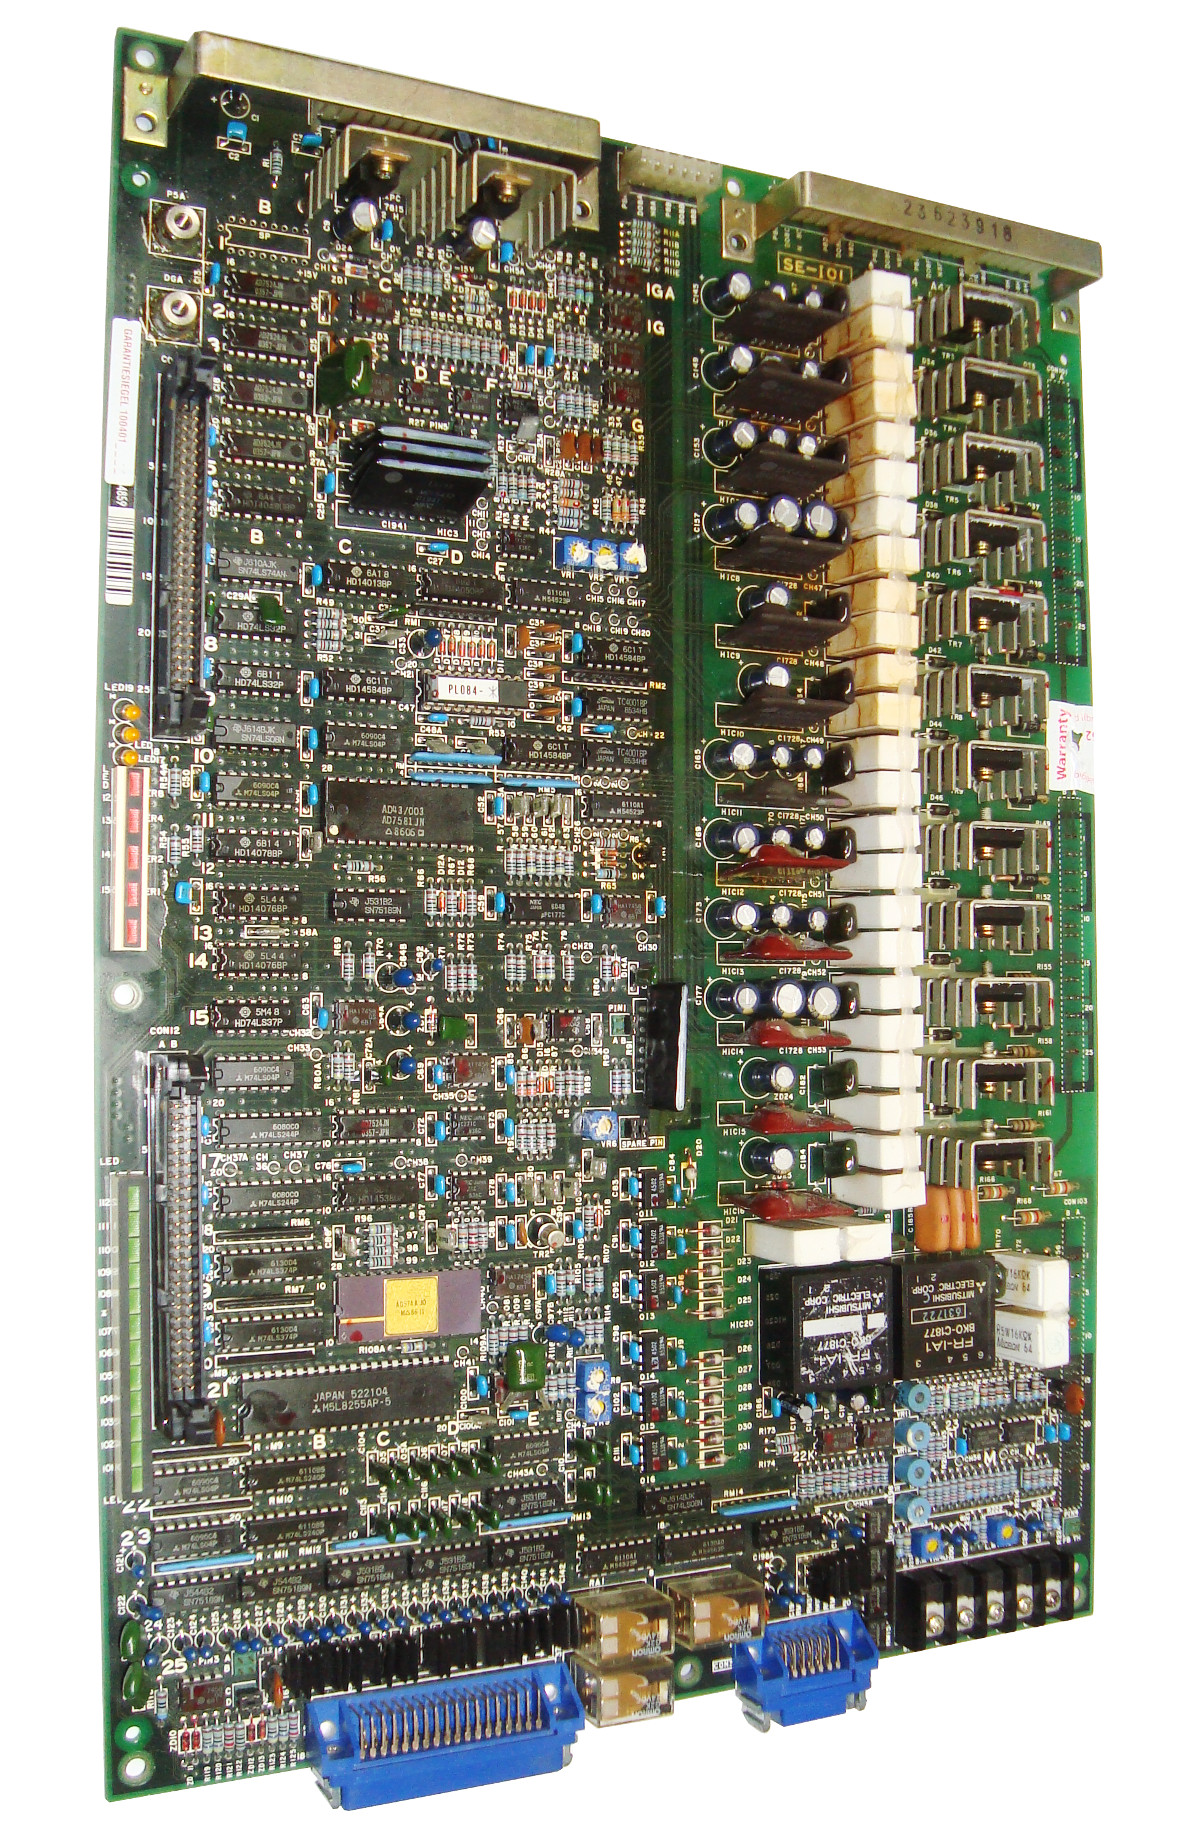 SHOP, Kaufen: MITSUBISHI ELECTRIC SE-IO1 BOARD